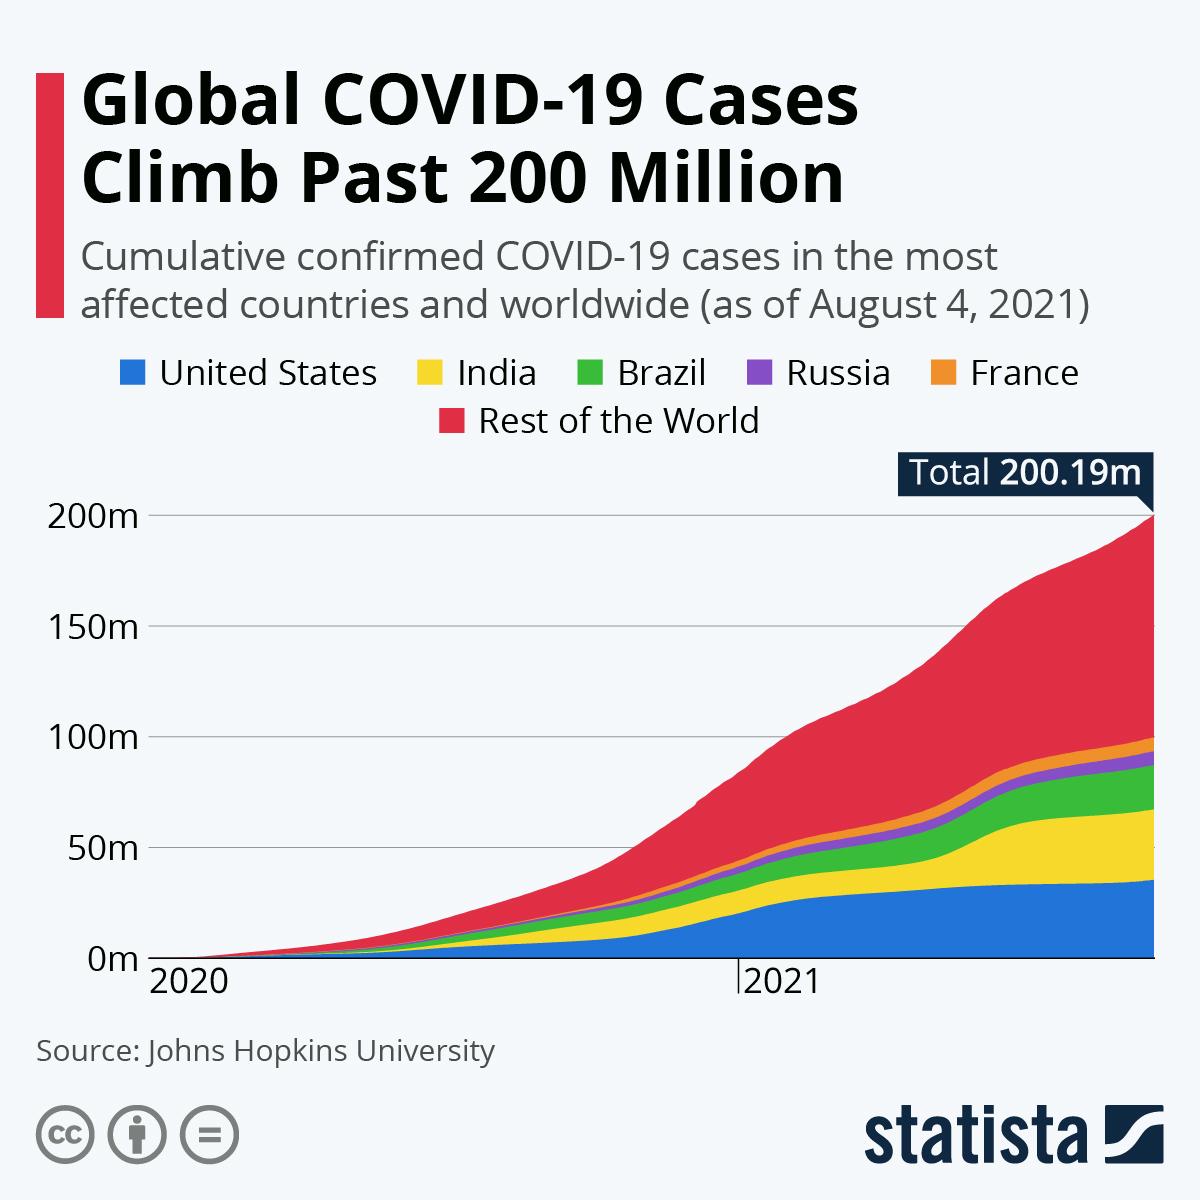 Global COVID-19 Cases Climb Past 200 Million